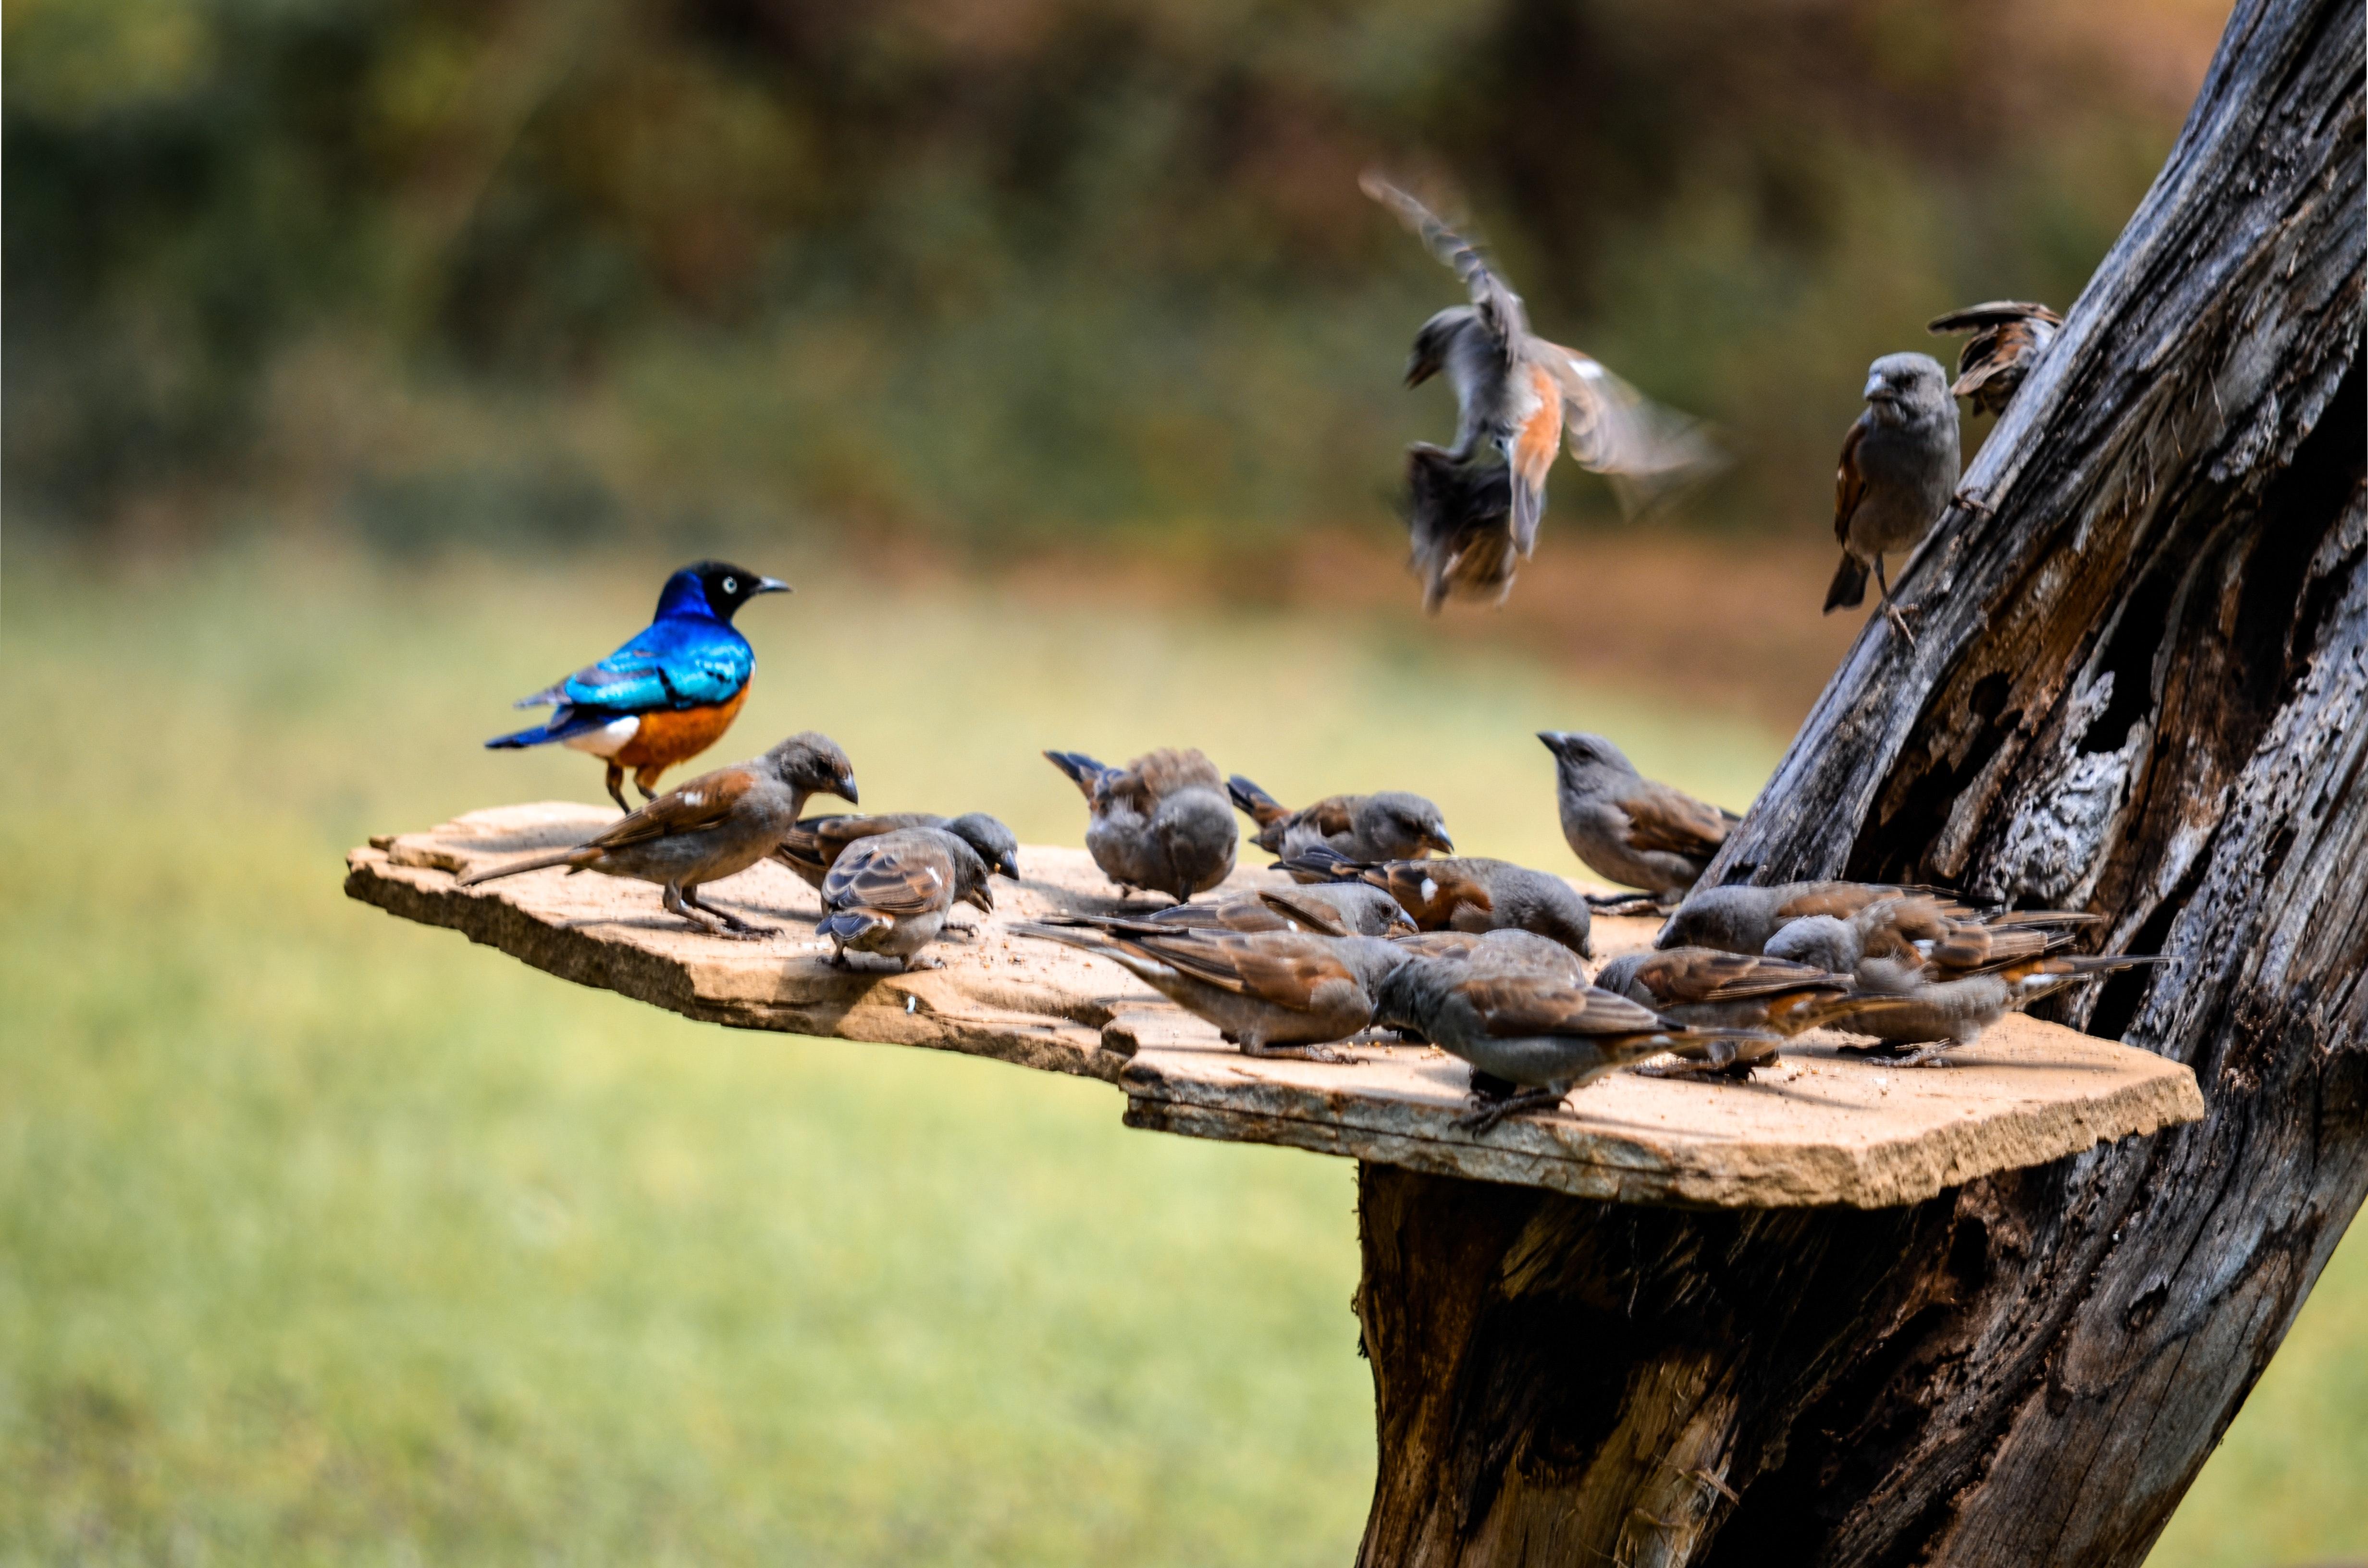 Flock of Birds, Outdoors, Wood, Wildlife photography, Wildlife, HQ Photo